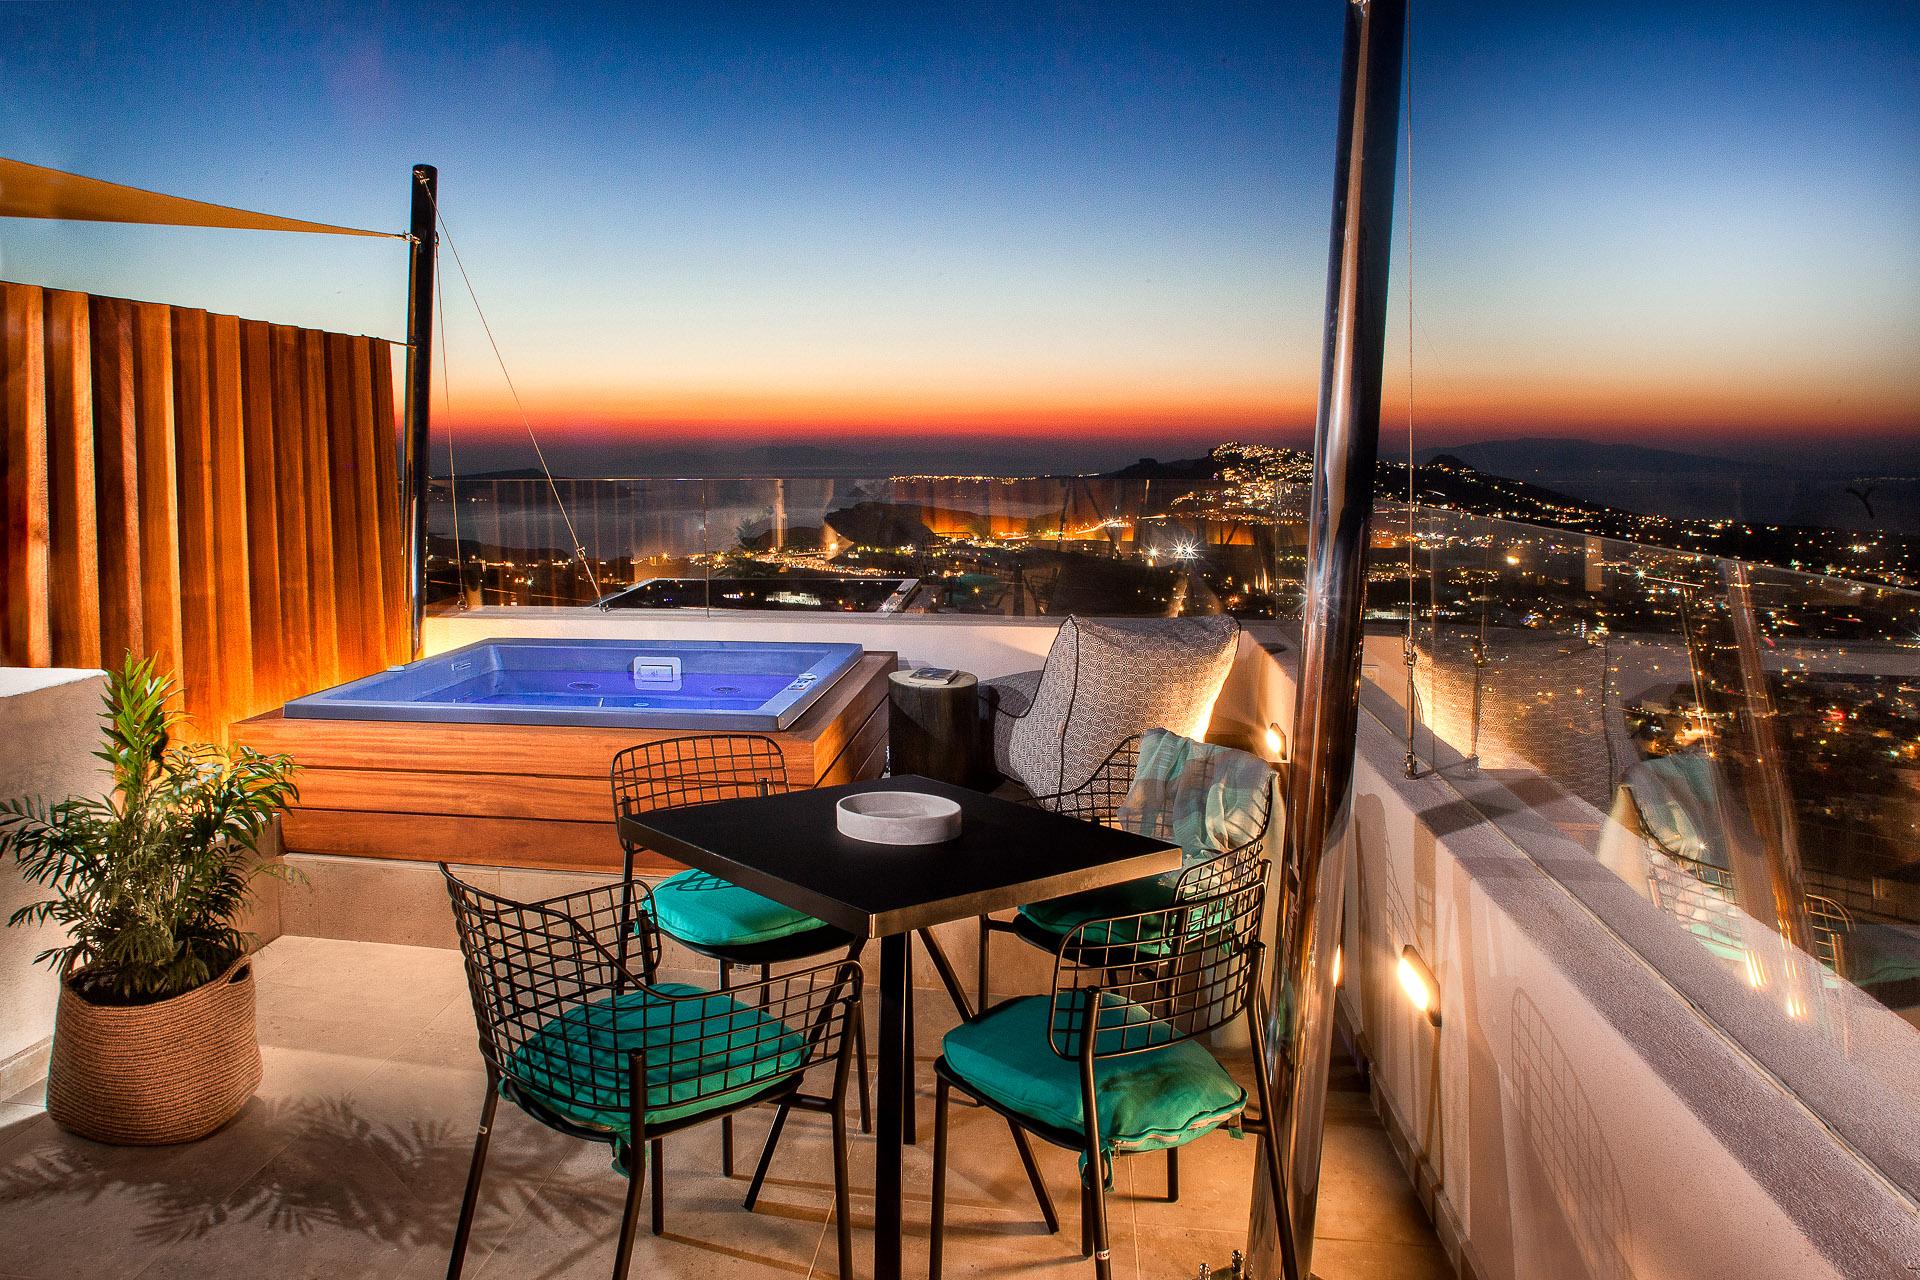 santorini booking, airbnb santorini, santorini luxury villas, chic hotel santorini, best hotels in santorini, volcano view hotel santorini, santorini hotels